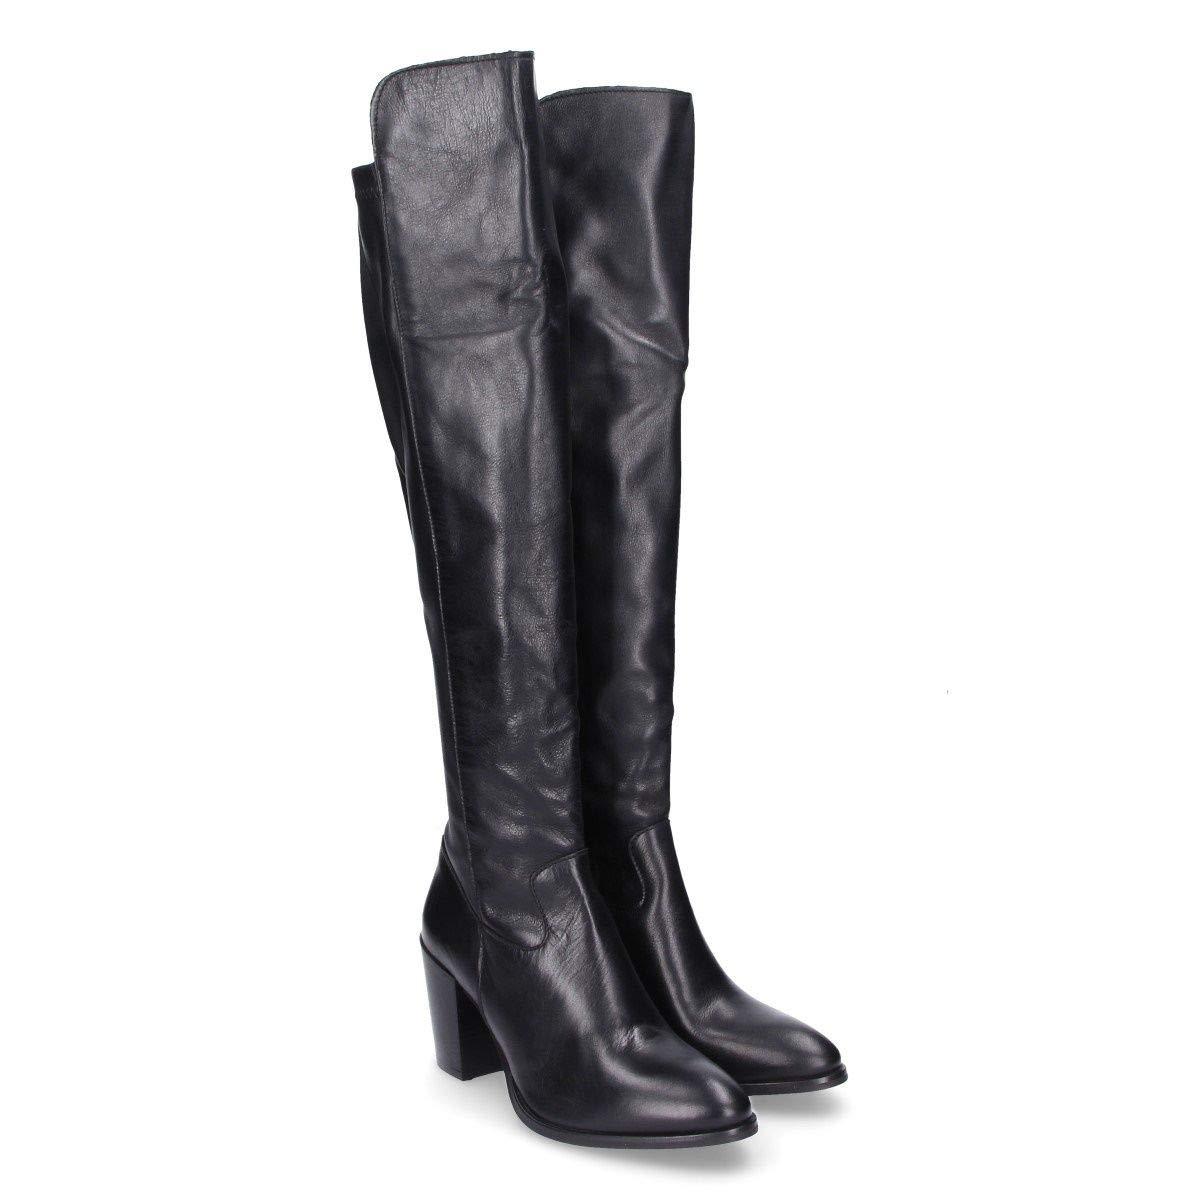 MOHAI Damen GRETAMOHschwarz Schwarz Leder Stiefel Stiefel Stiefel 7856e5